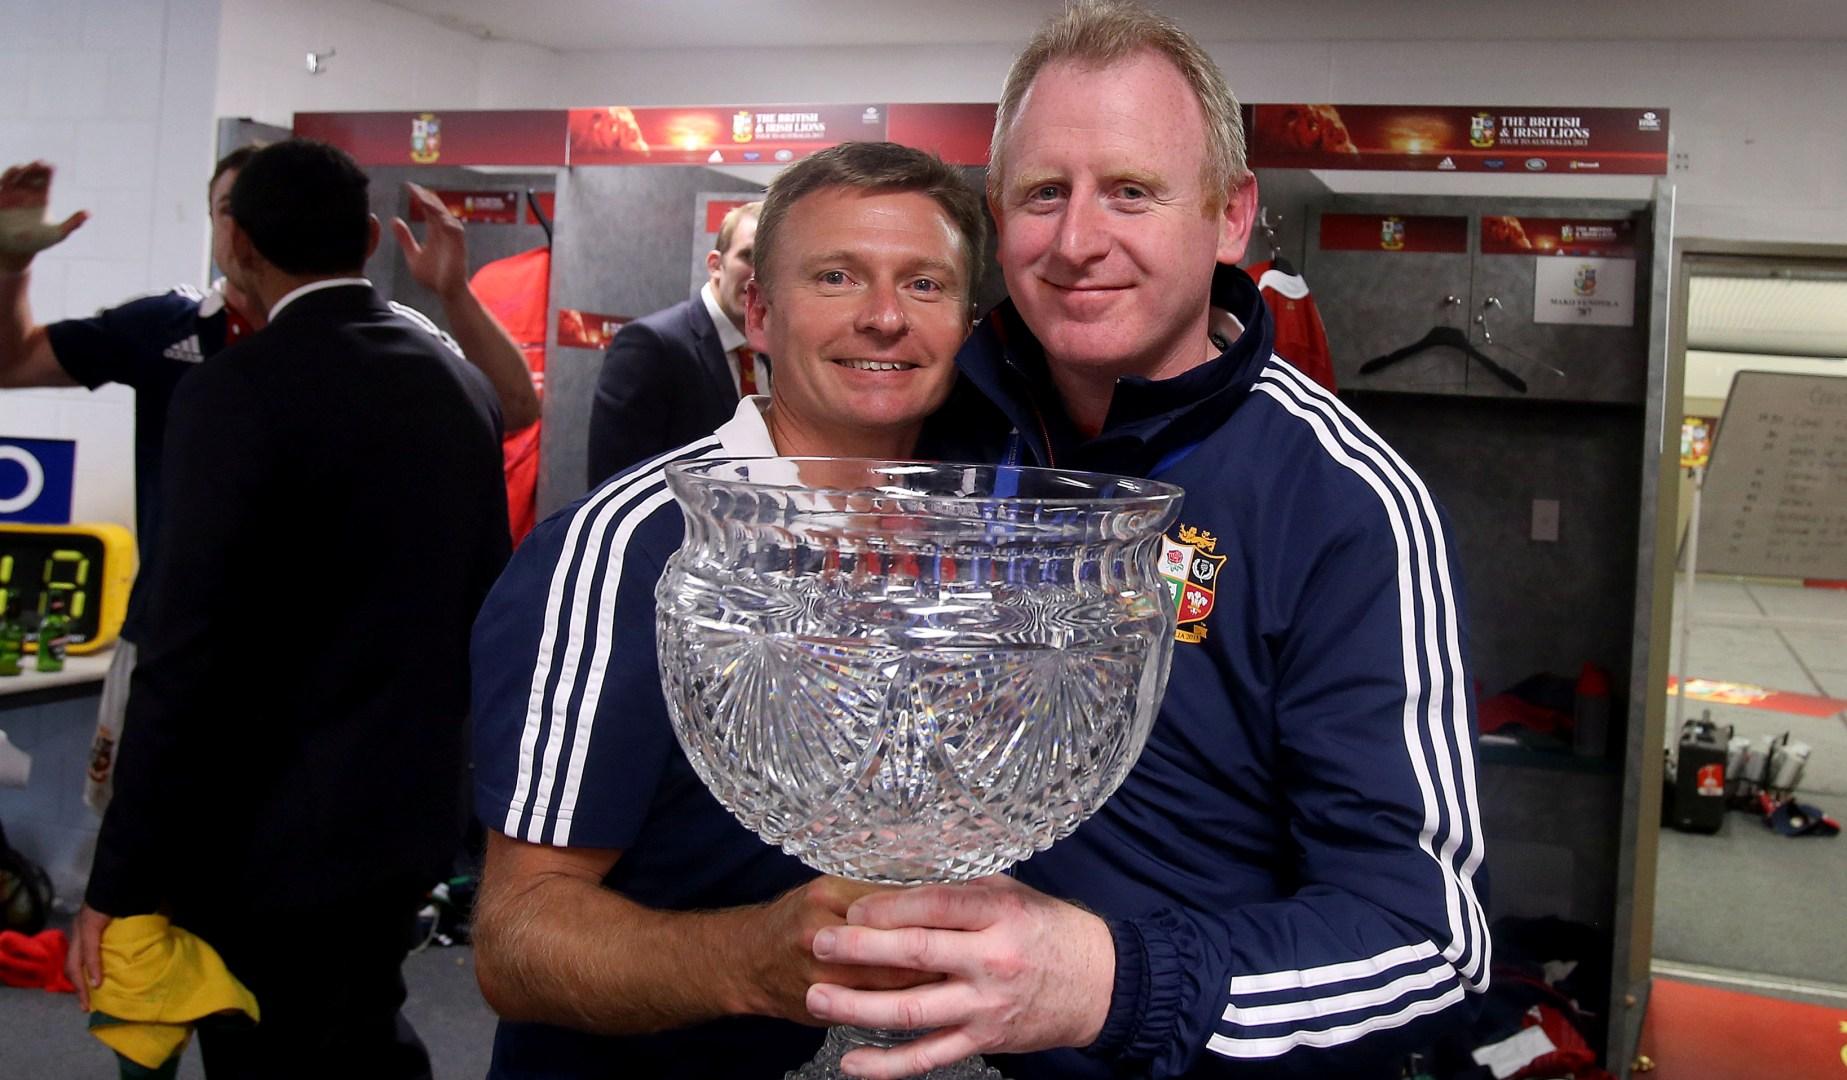 Lions Team: Ger Carmody on preparing for New Zealand